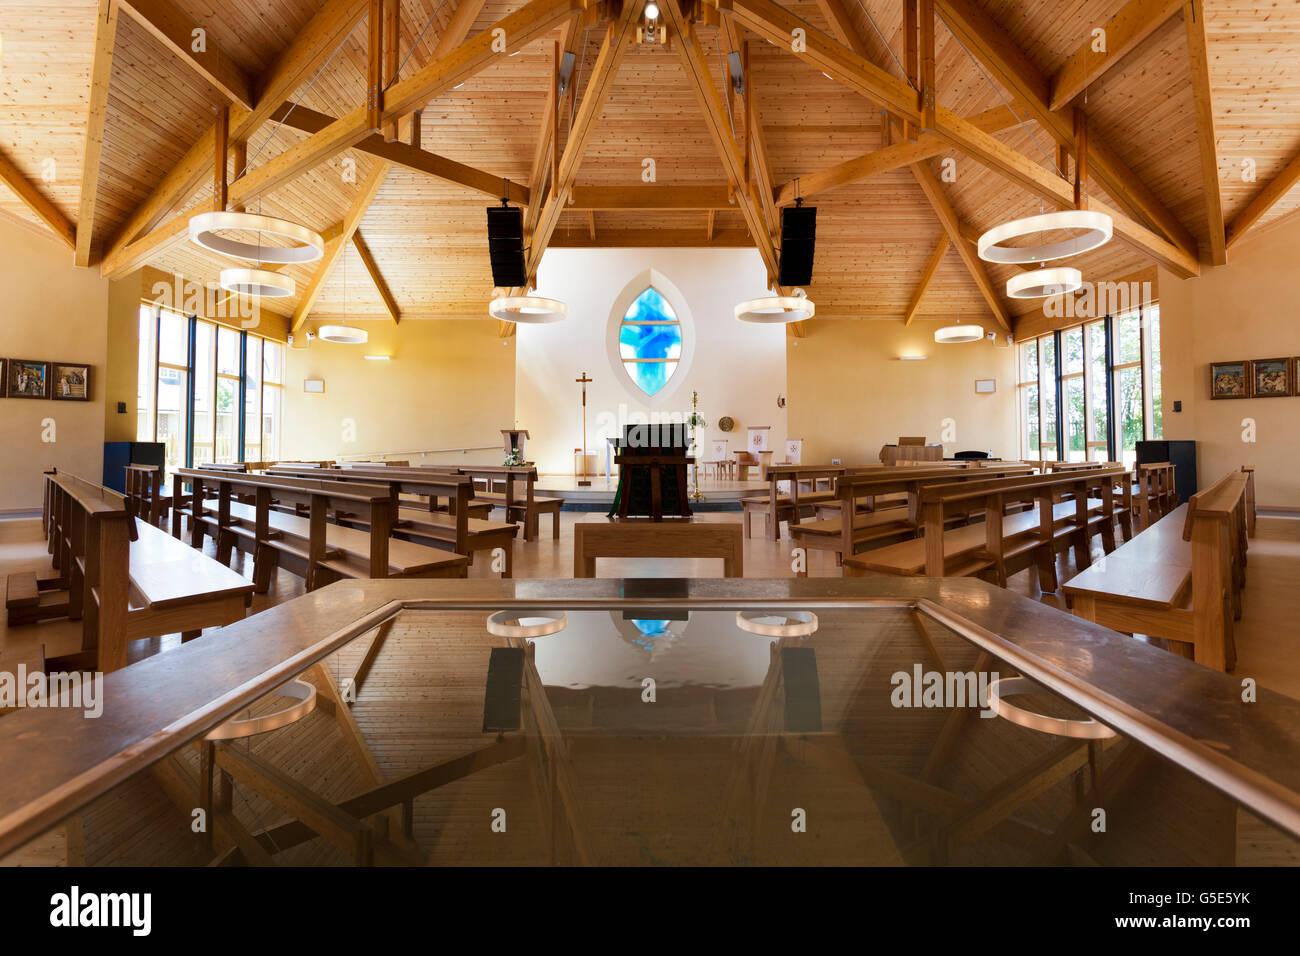 Modern Church Uk Interior Stock Photos & Modern Church Uk ...